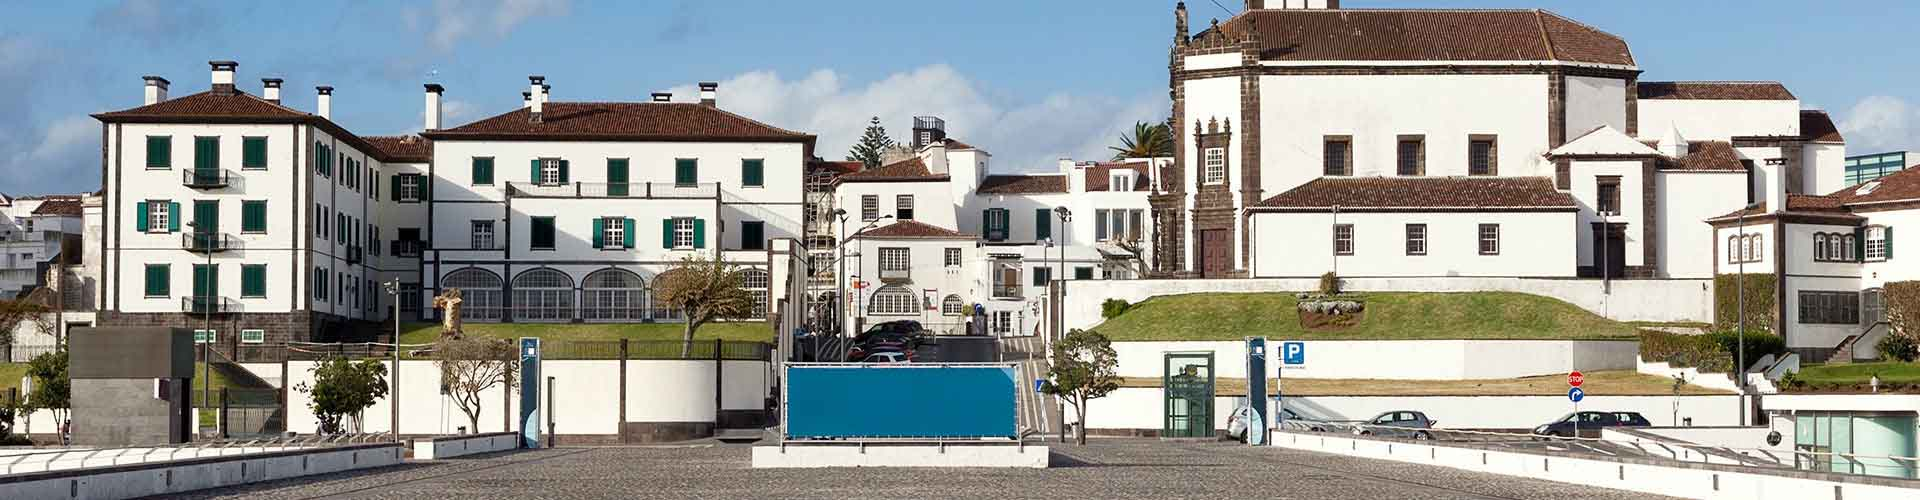 Ponta Delgada - Chambres à Ponta Delgada. Cartes pour Ponta Delgada, photos et commentaires pour chaque chambre à Ponta Delgada.